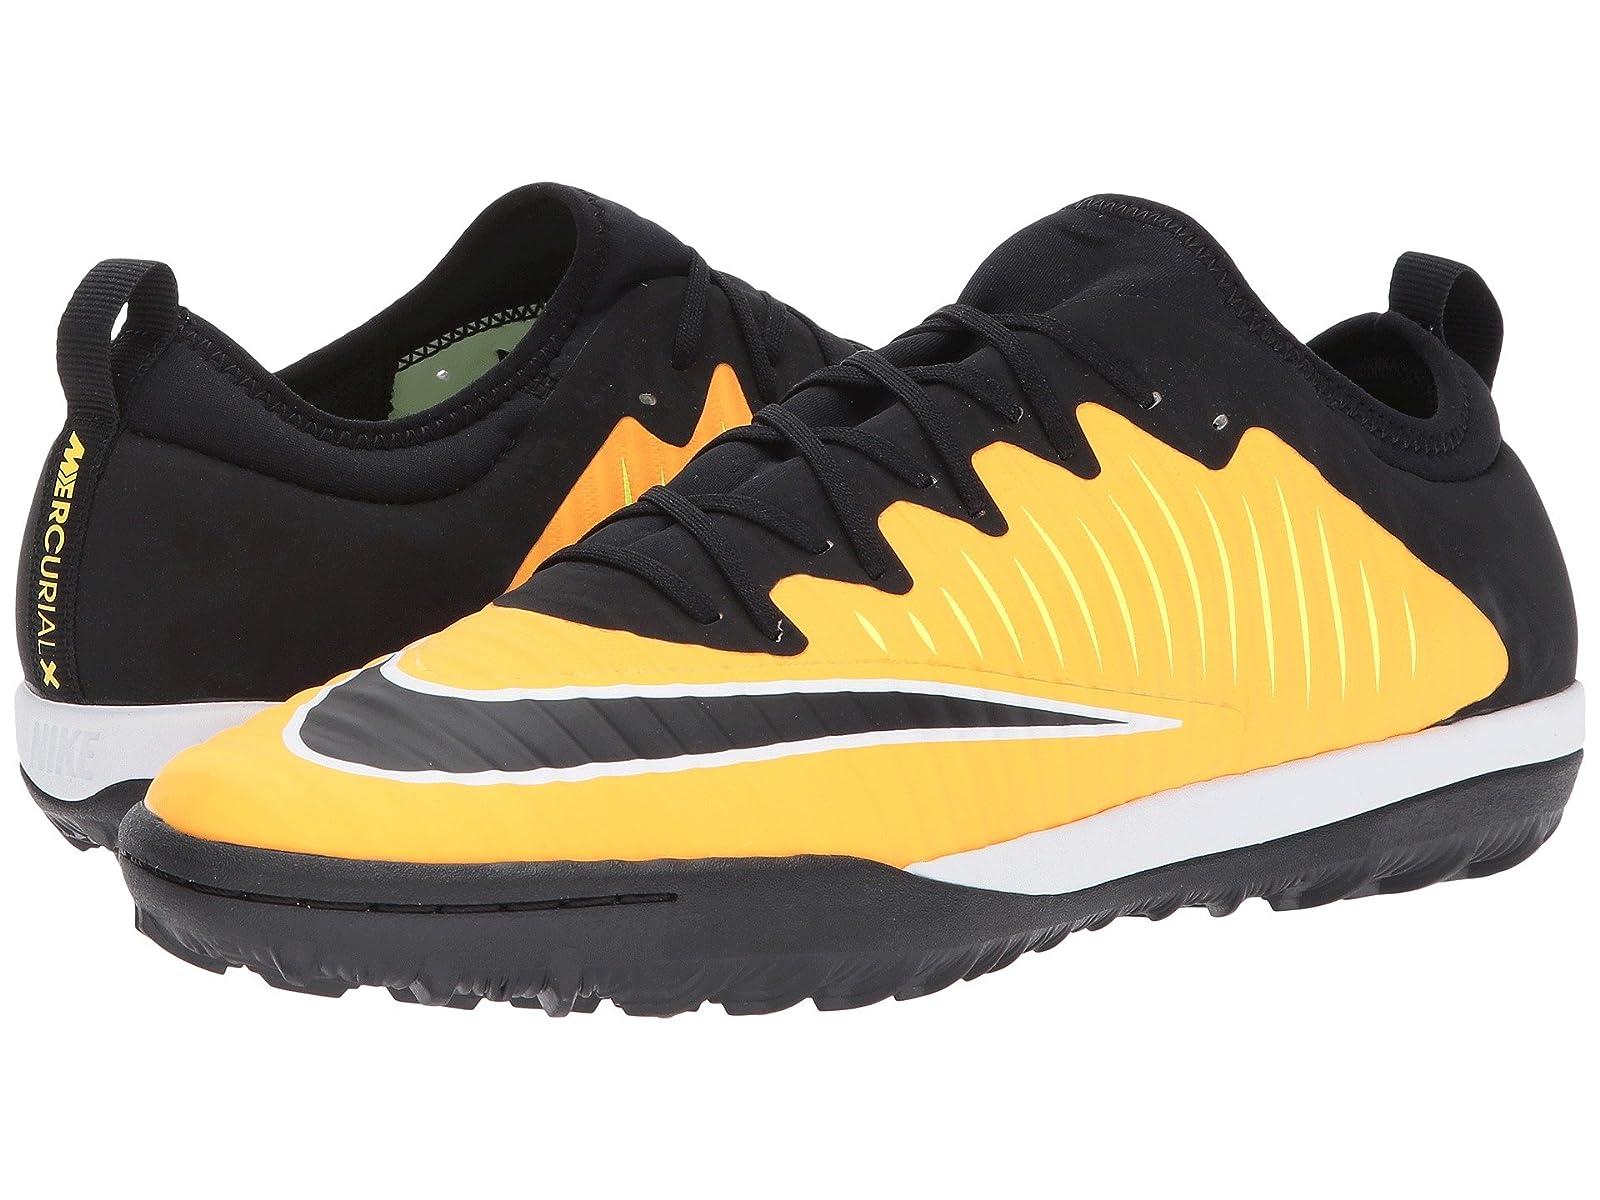 Nike MercurialX Finale II TFCheap and distinctive eye-catching shoes